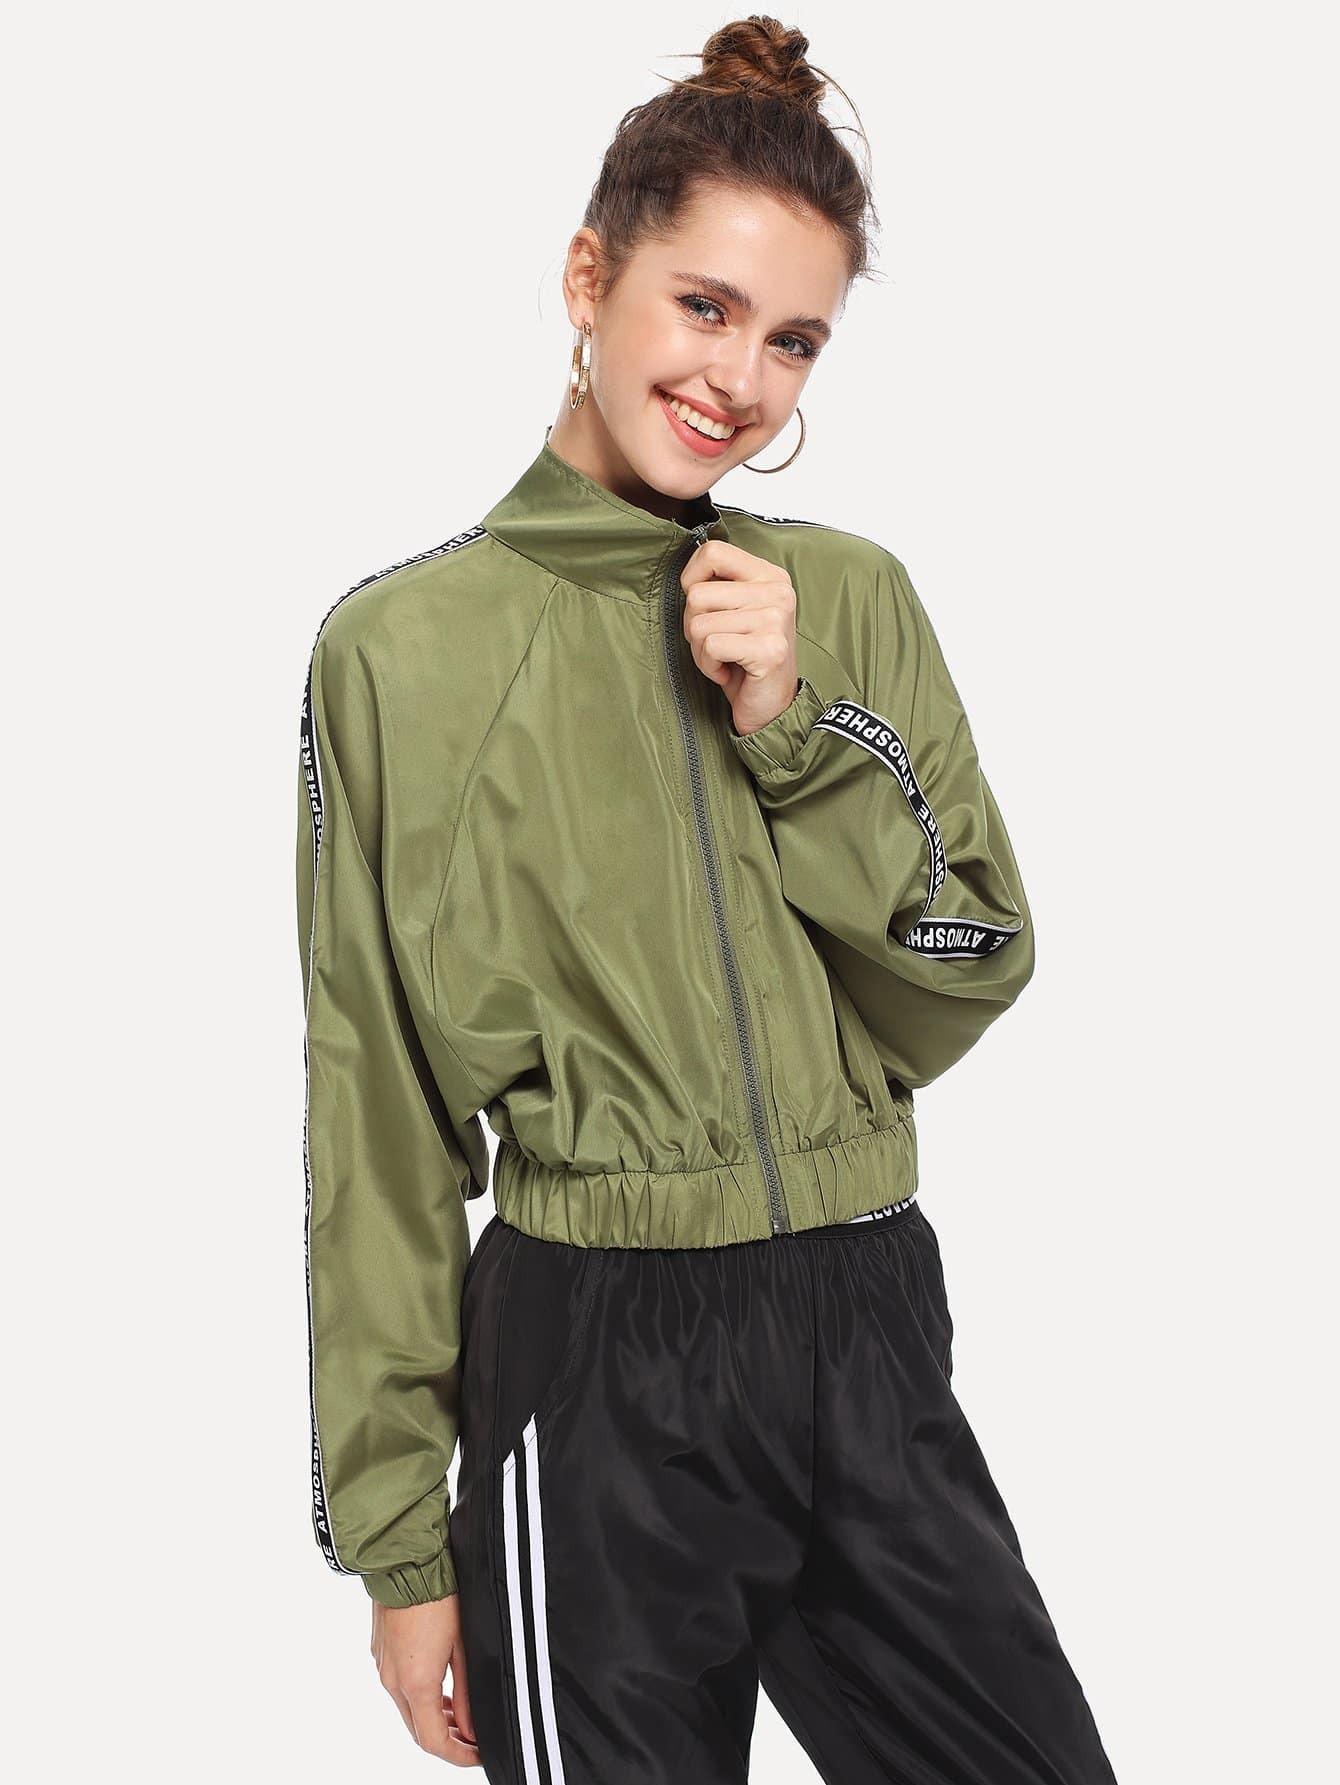 Эластичный чехол Zip Up Crop Jacket, Nedab, SheIn  - купить со скидкой